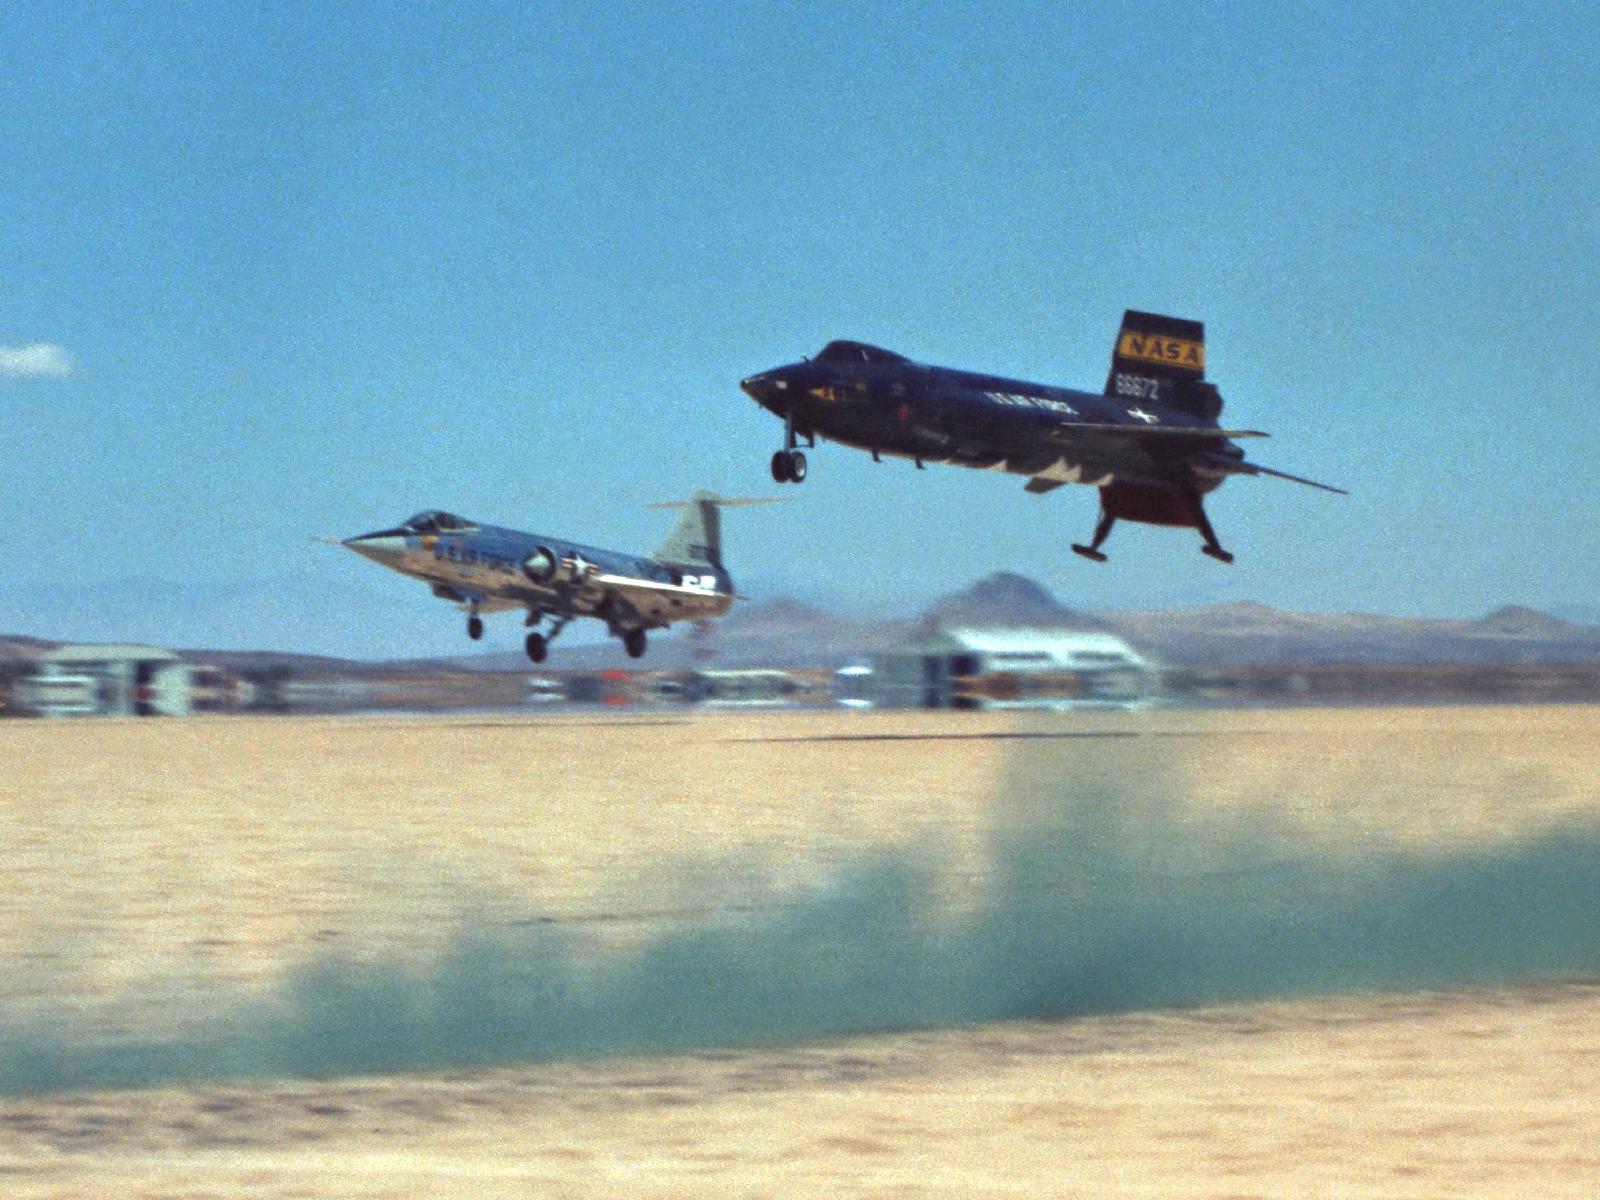 X-15 Nears Touchdown with Starfighter